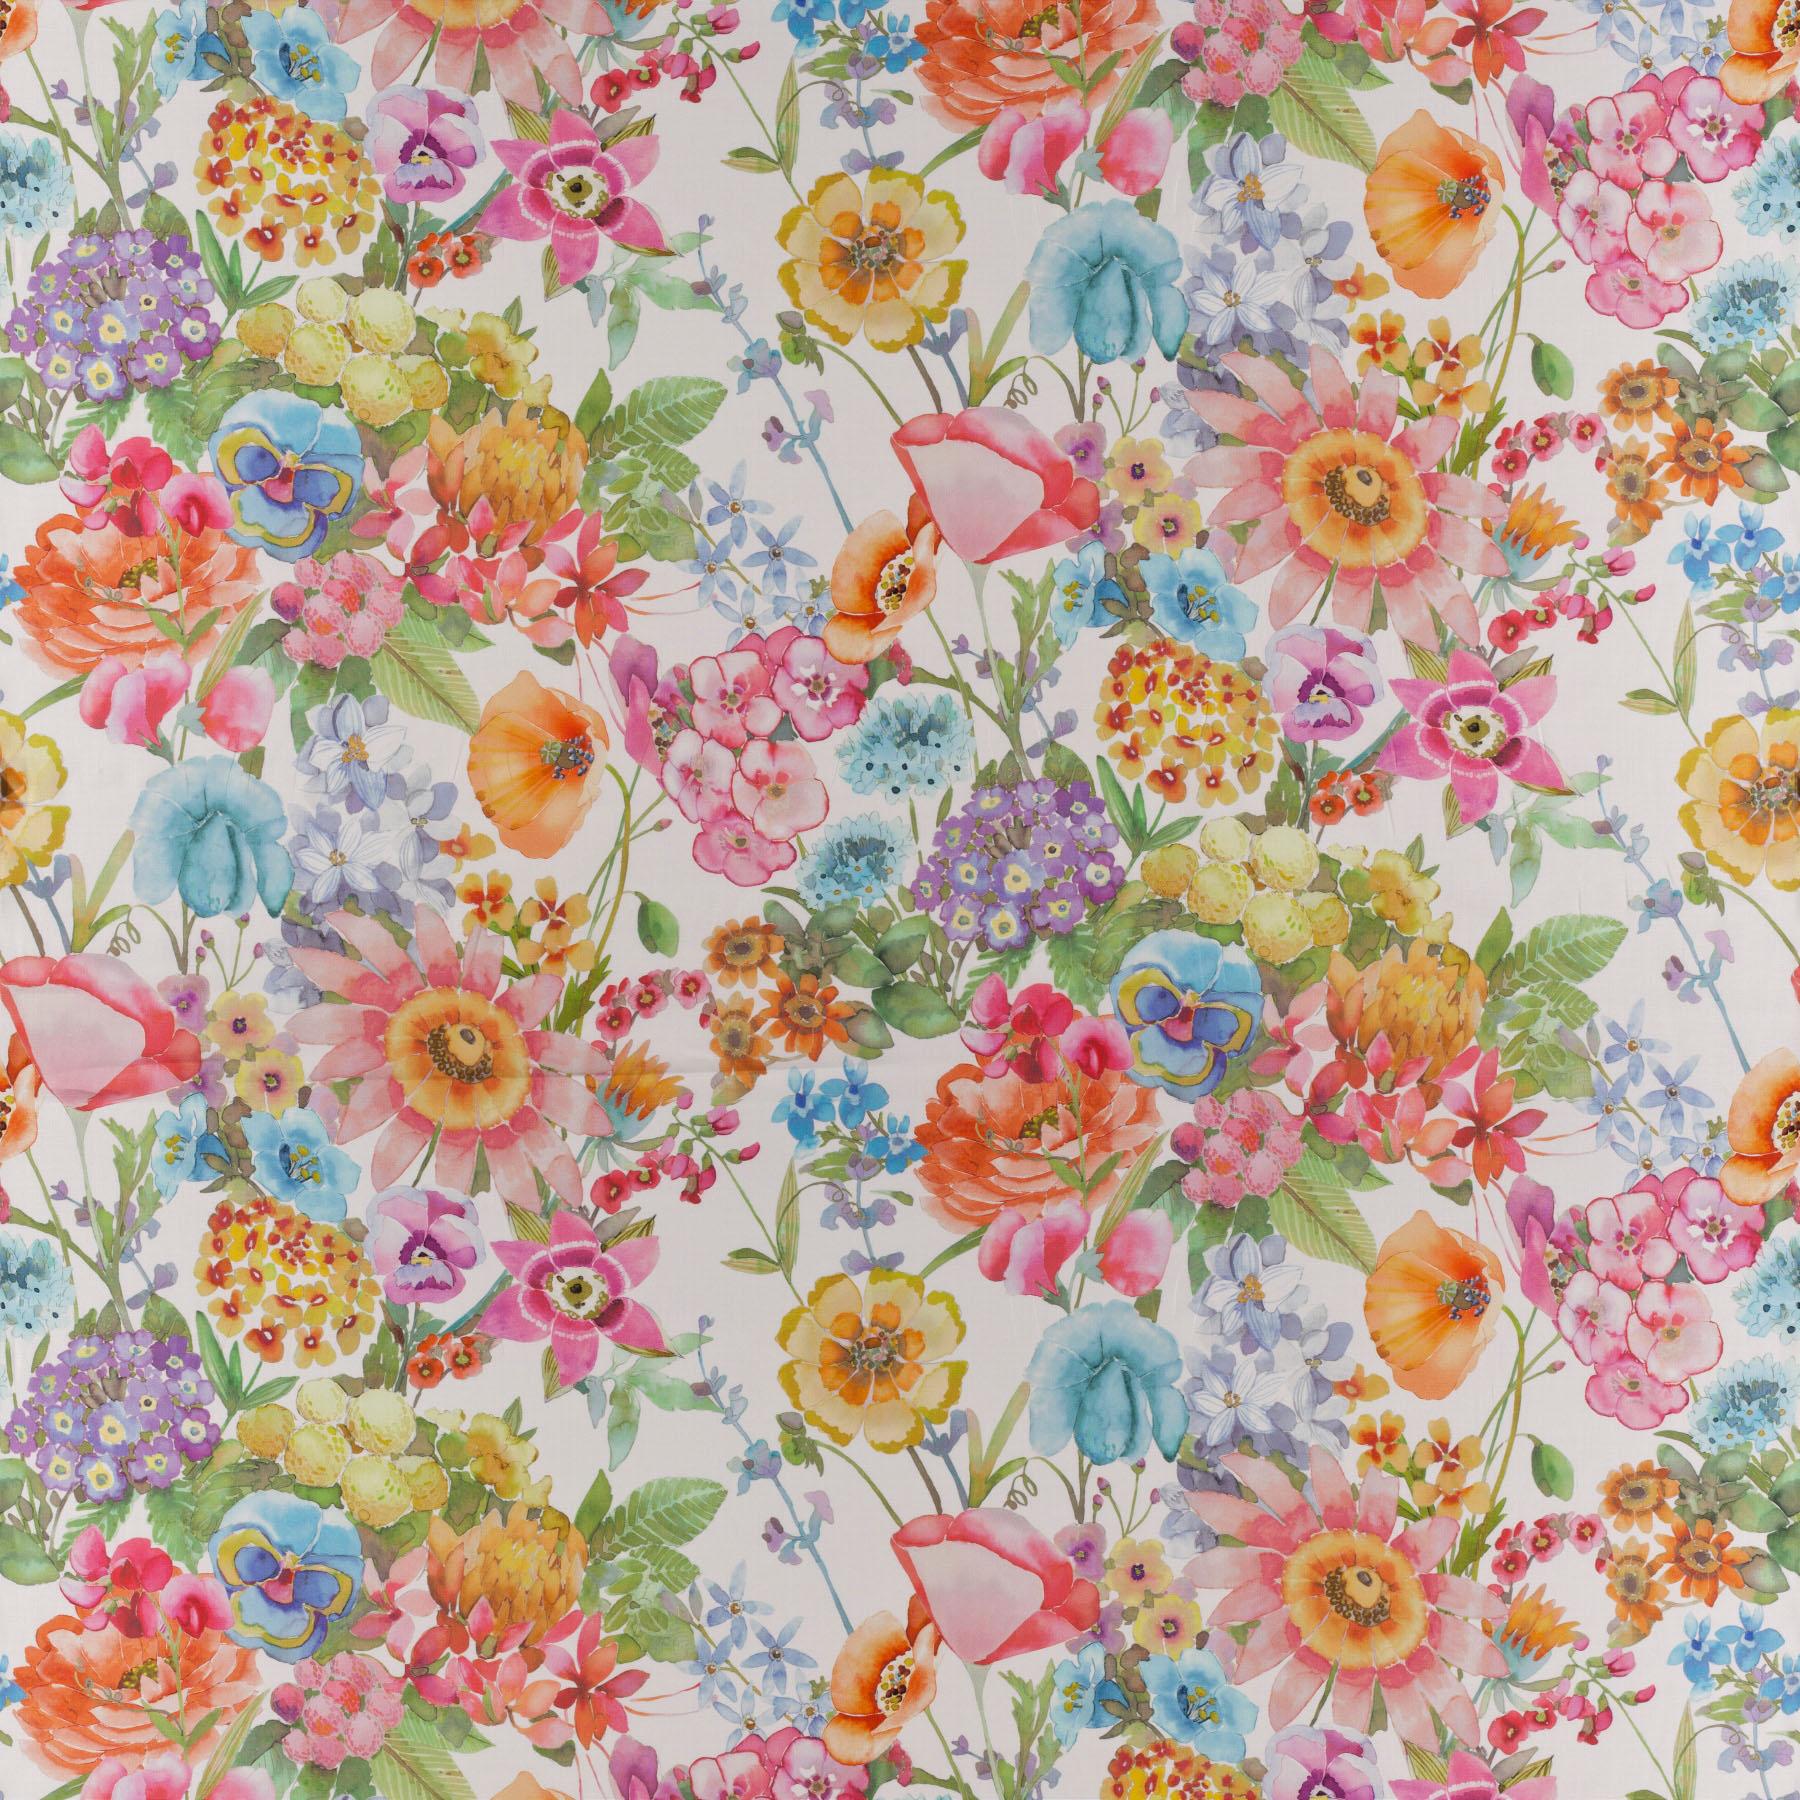 decoration fabric arbre fleuri 1 8711 168 jab anstoetz fabrics. Black Bedroom Furniture Sets. Home Design Ideas